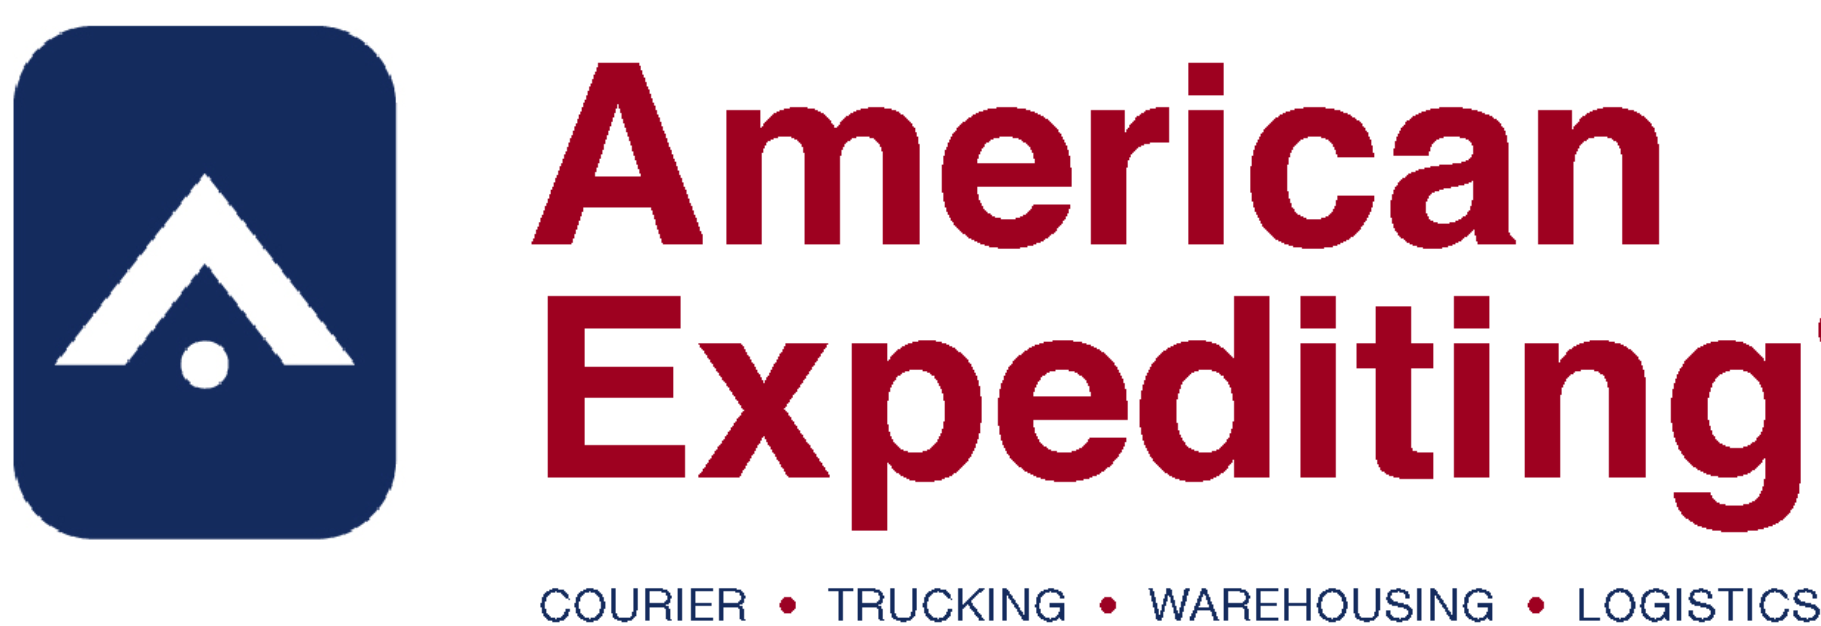 American Expediting Company Logo